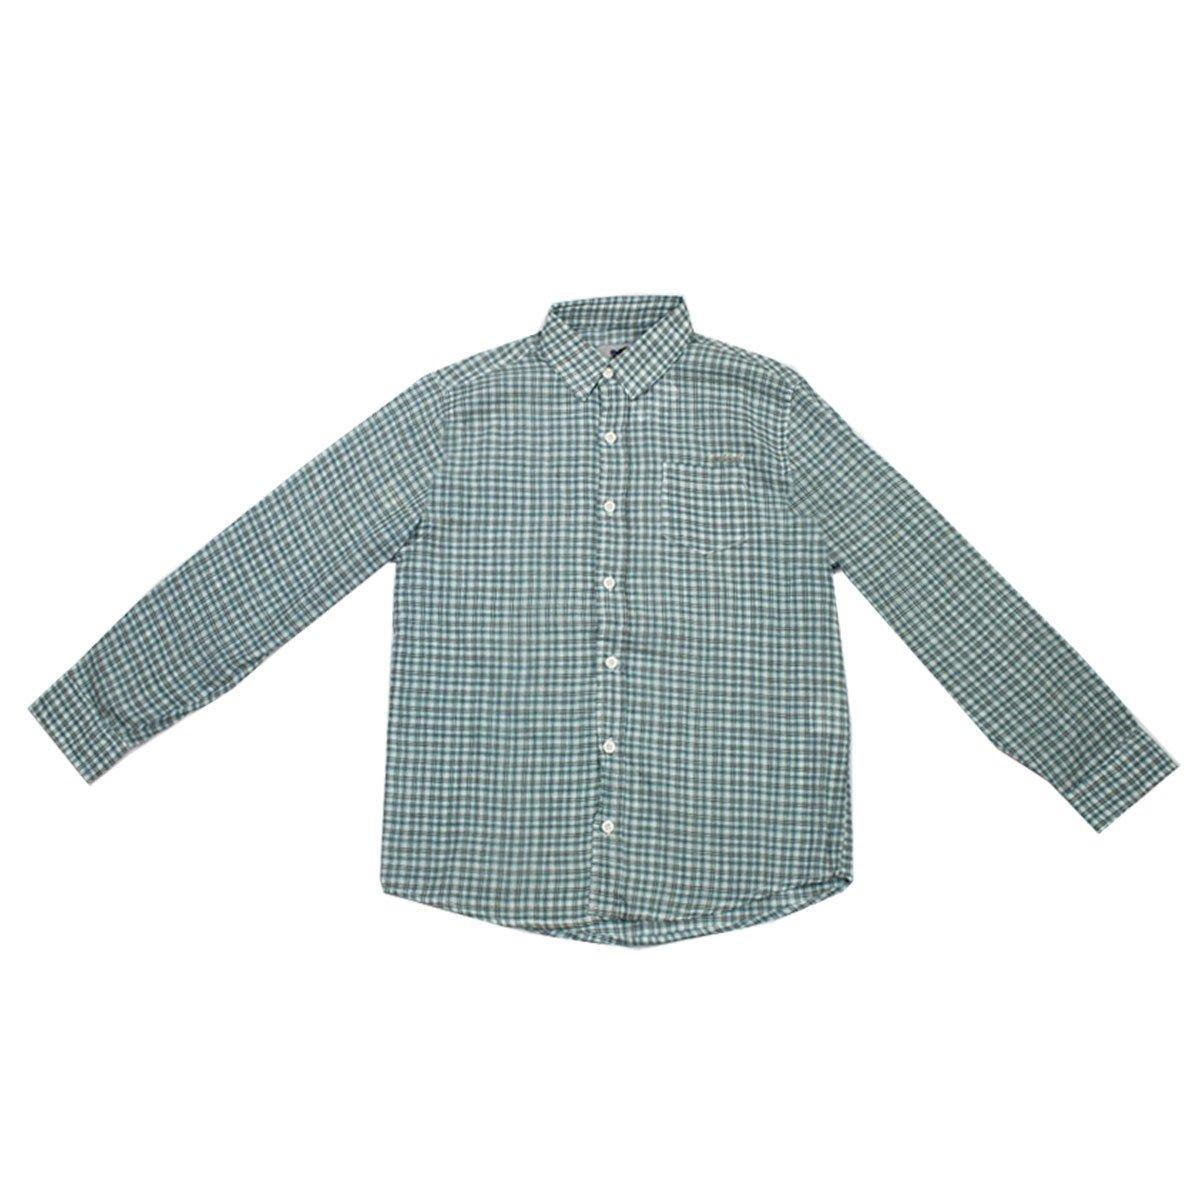 1d3ced478 Bizz Store - Camisa Xadrez Infantil Menino Colcci Fun